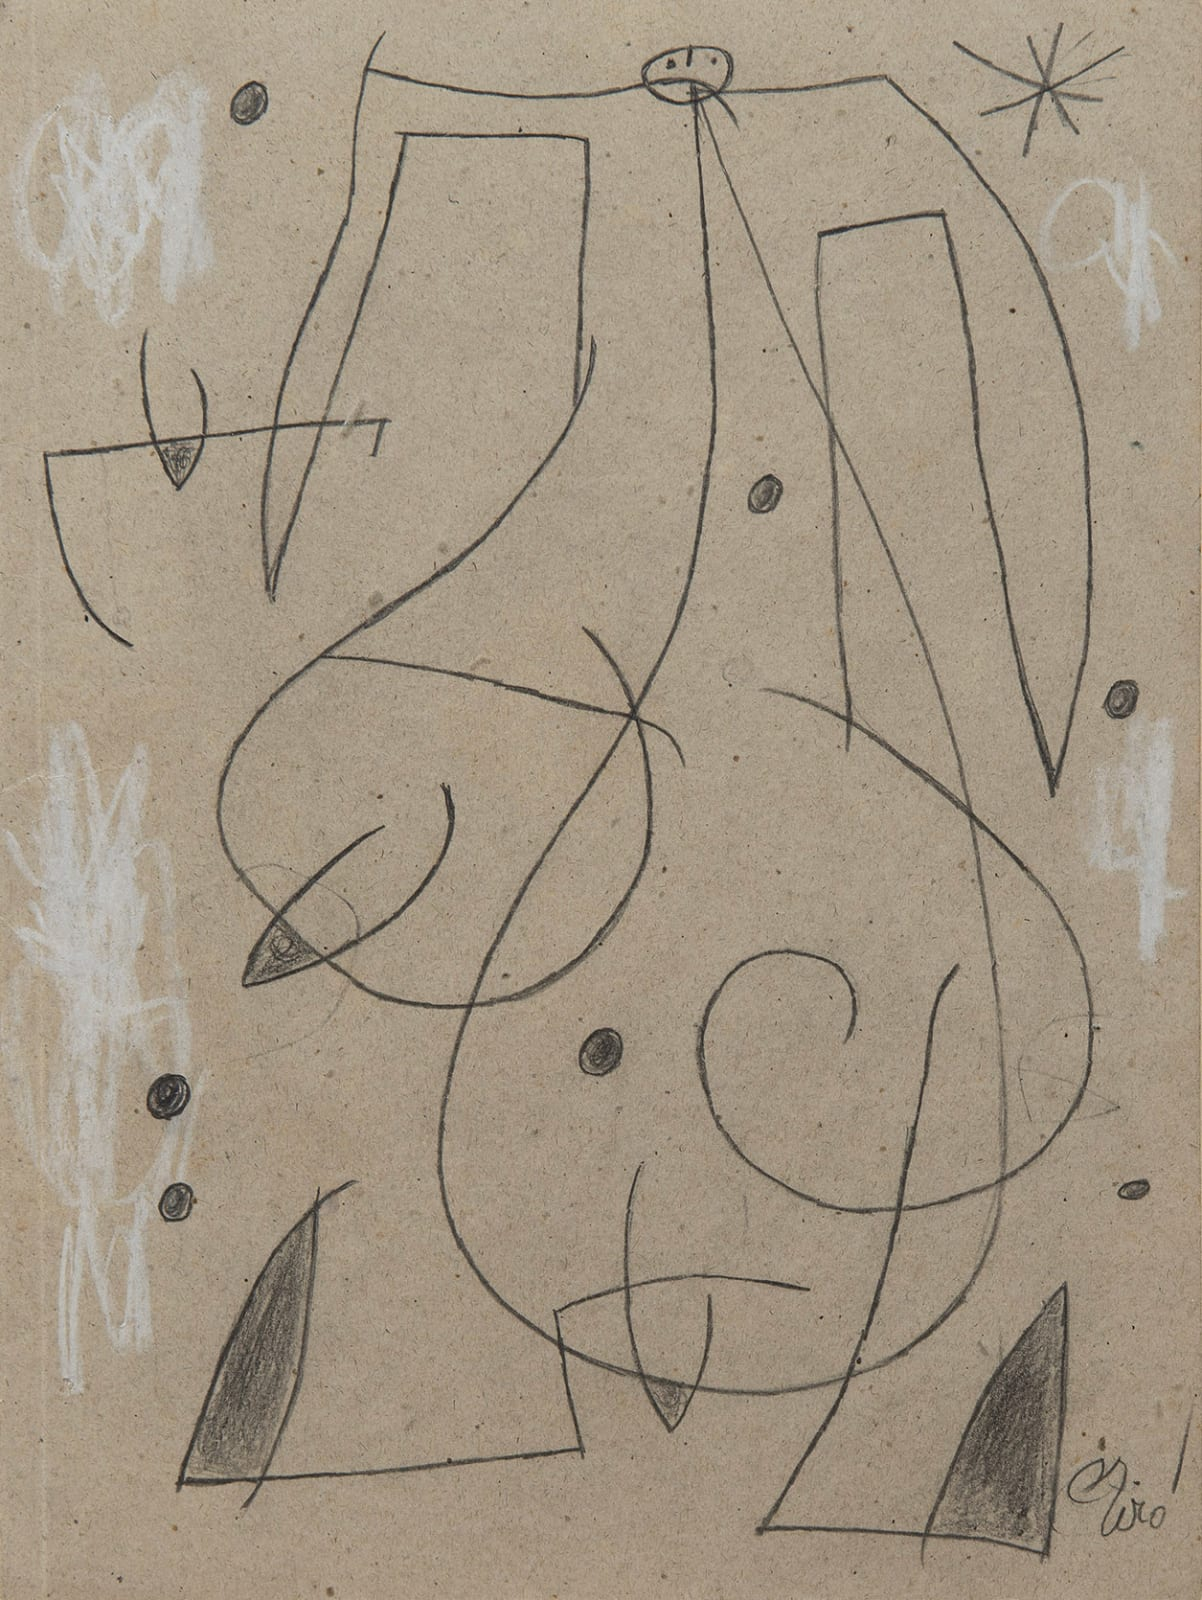 JOAN MIRO, Femme, oiseau, étoile, constellations, 26.II.77